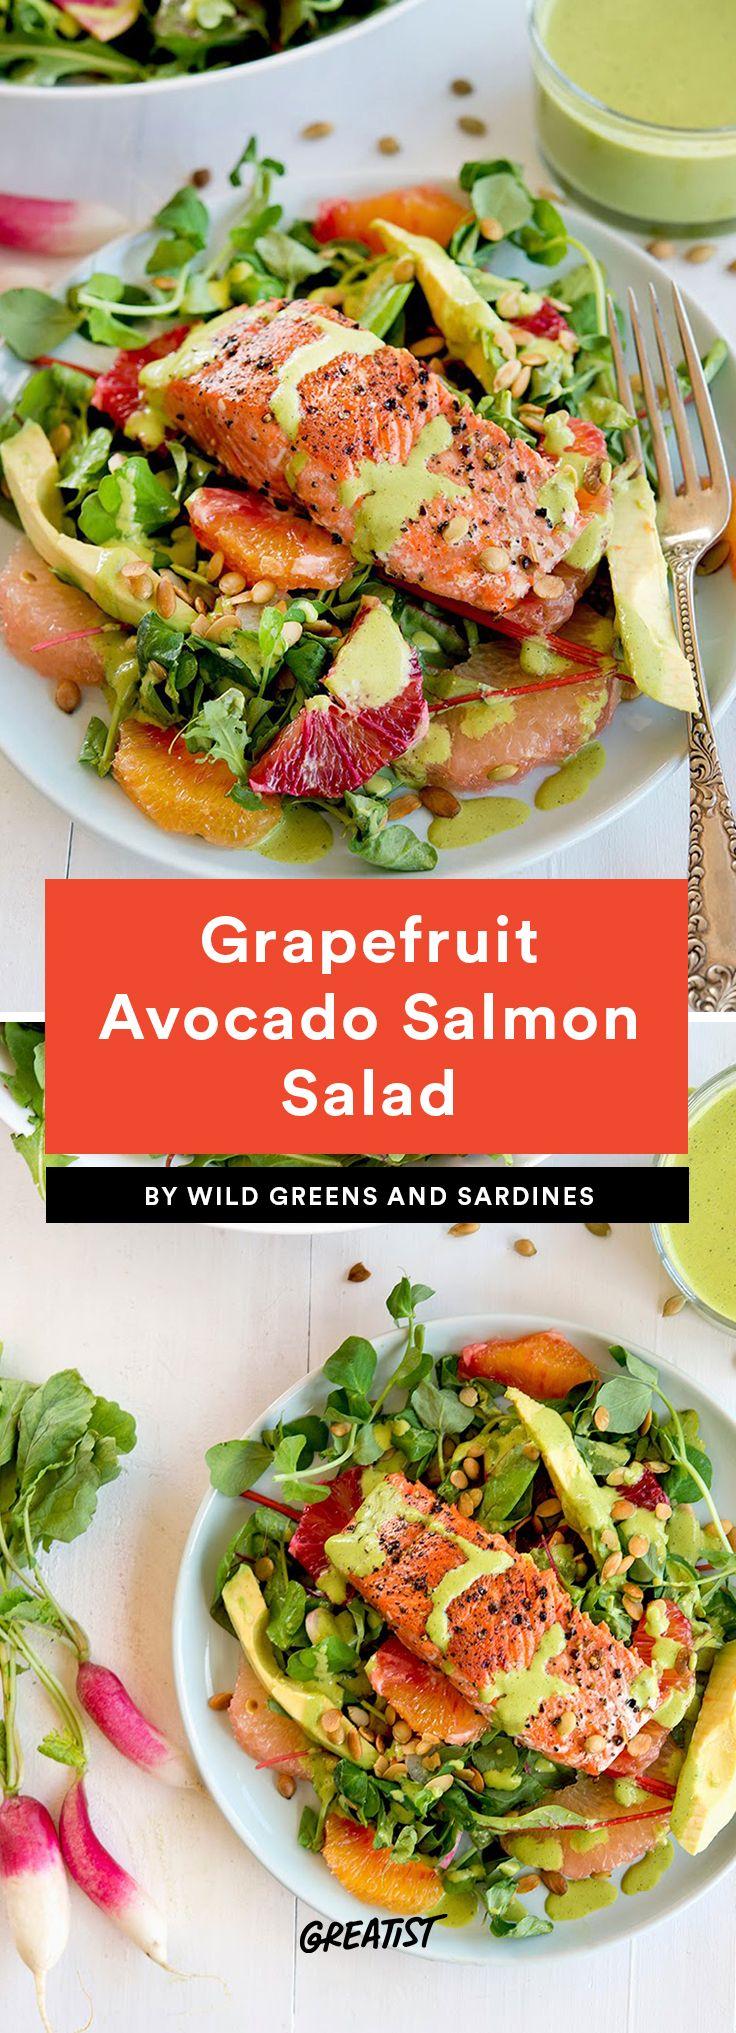 1. Grapefruit Avocado Salmon Salad #greatist https://greatist.com/eat/grapefruit-recipes